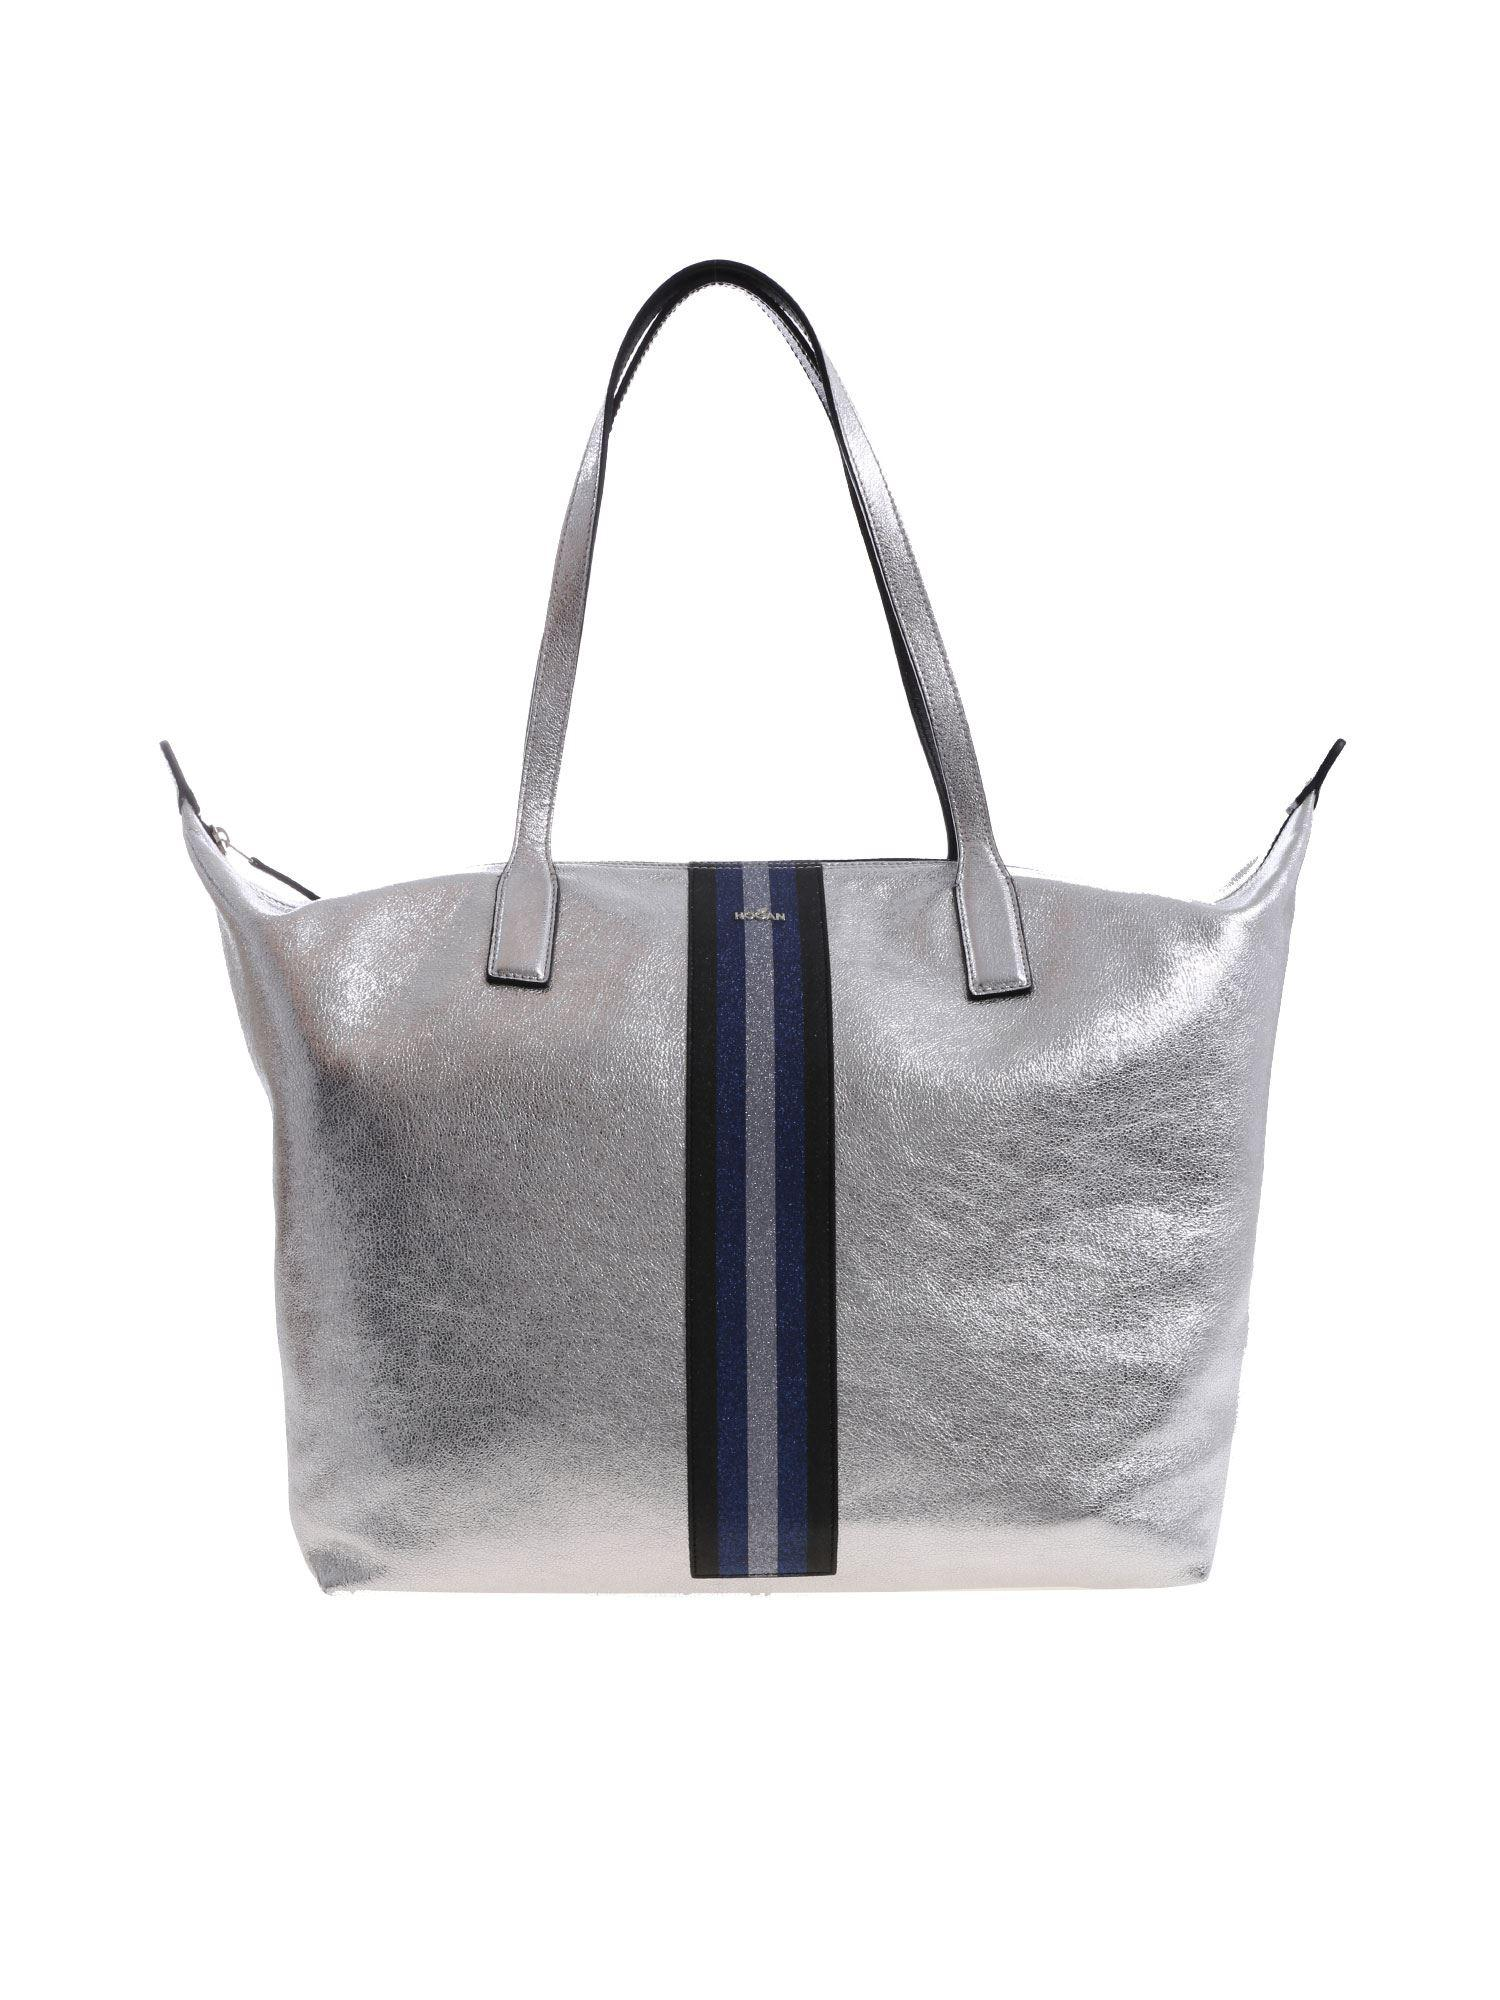 7e9048ba6dc Lyst - Hogan Silver Bag With Glitter Details in Metallic